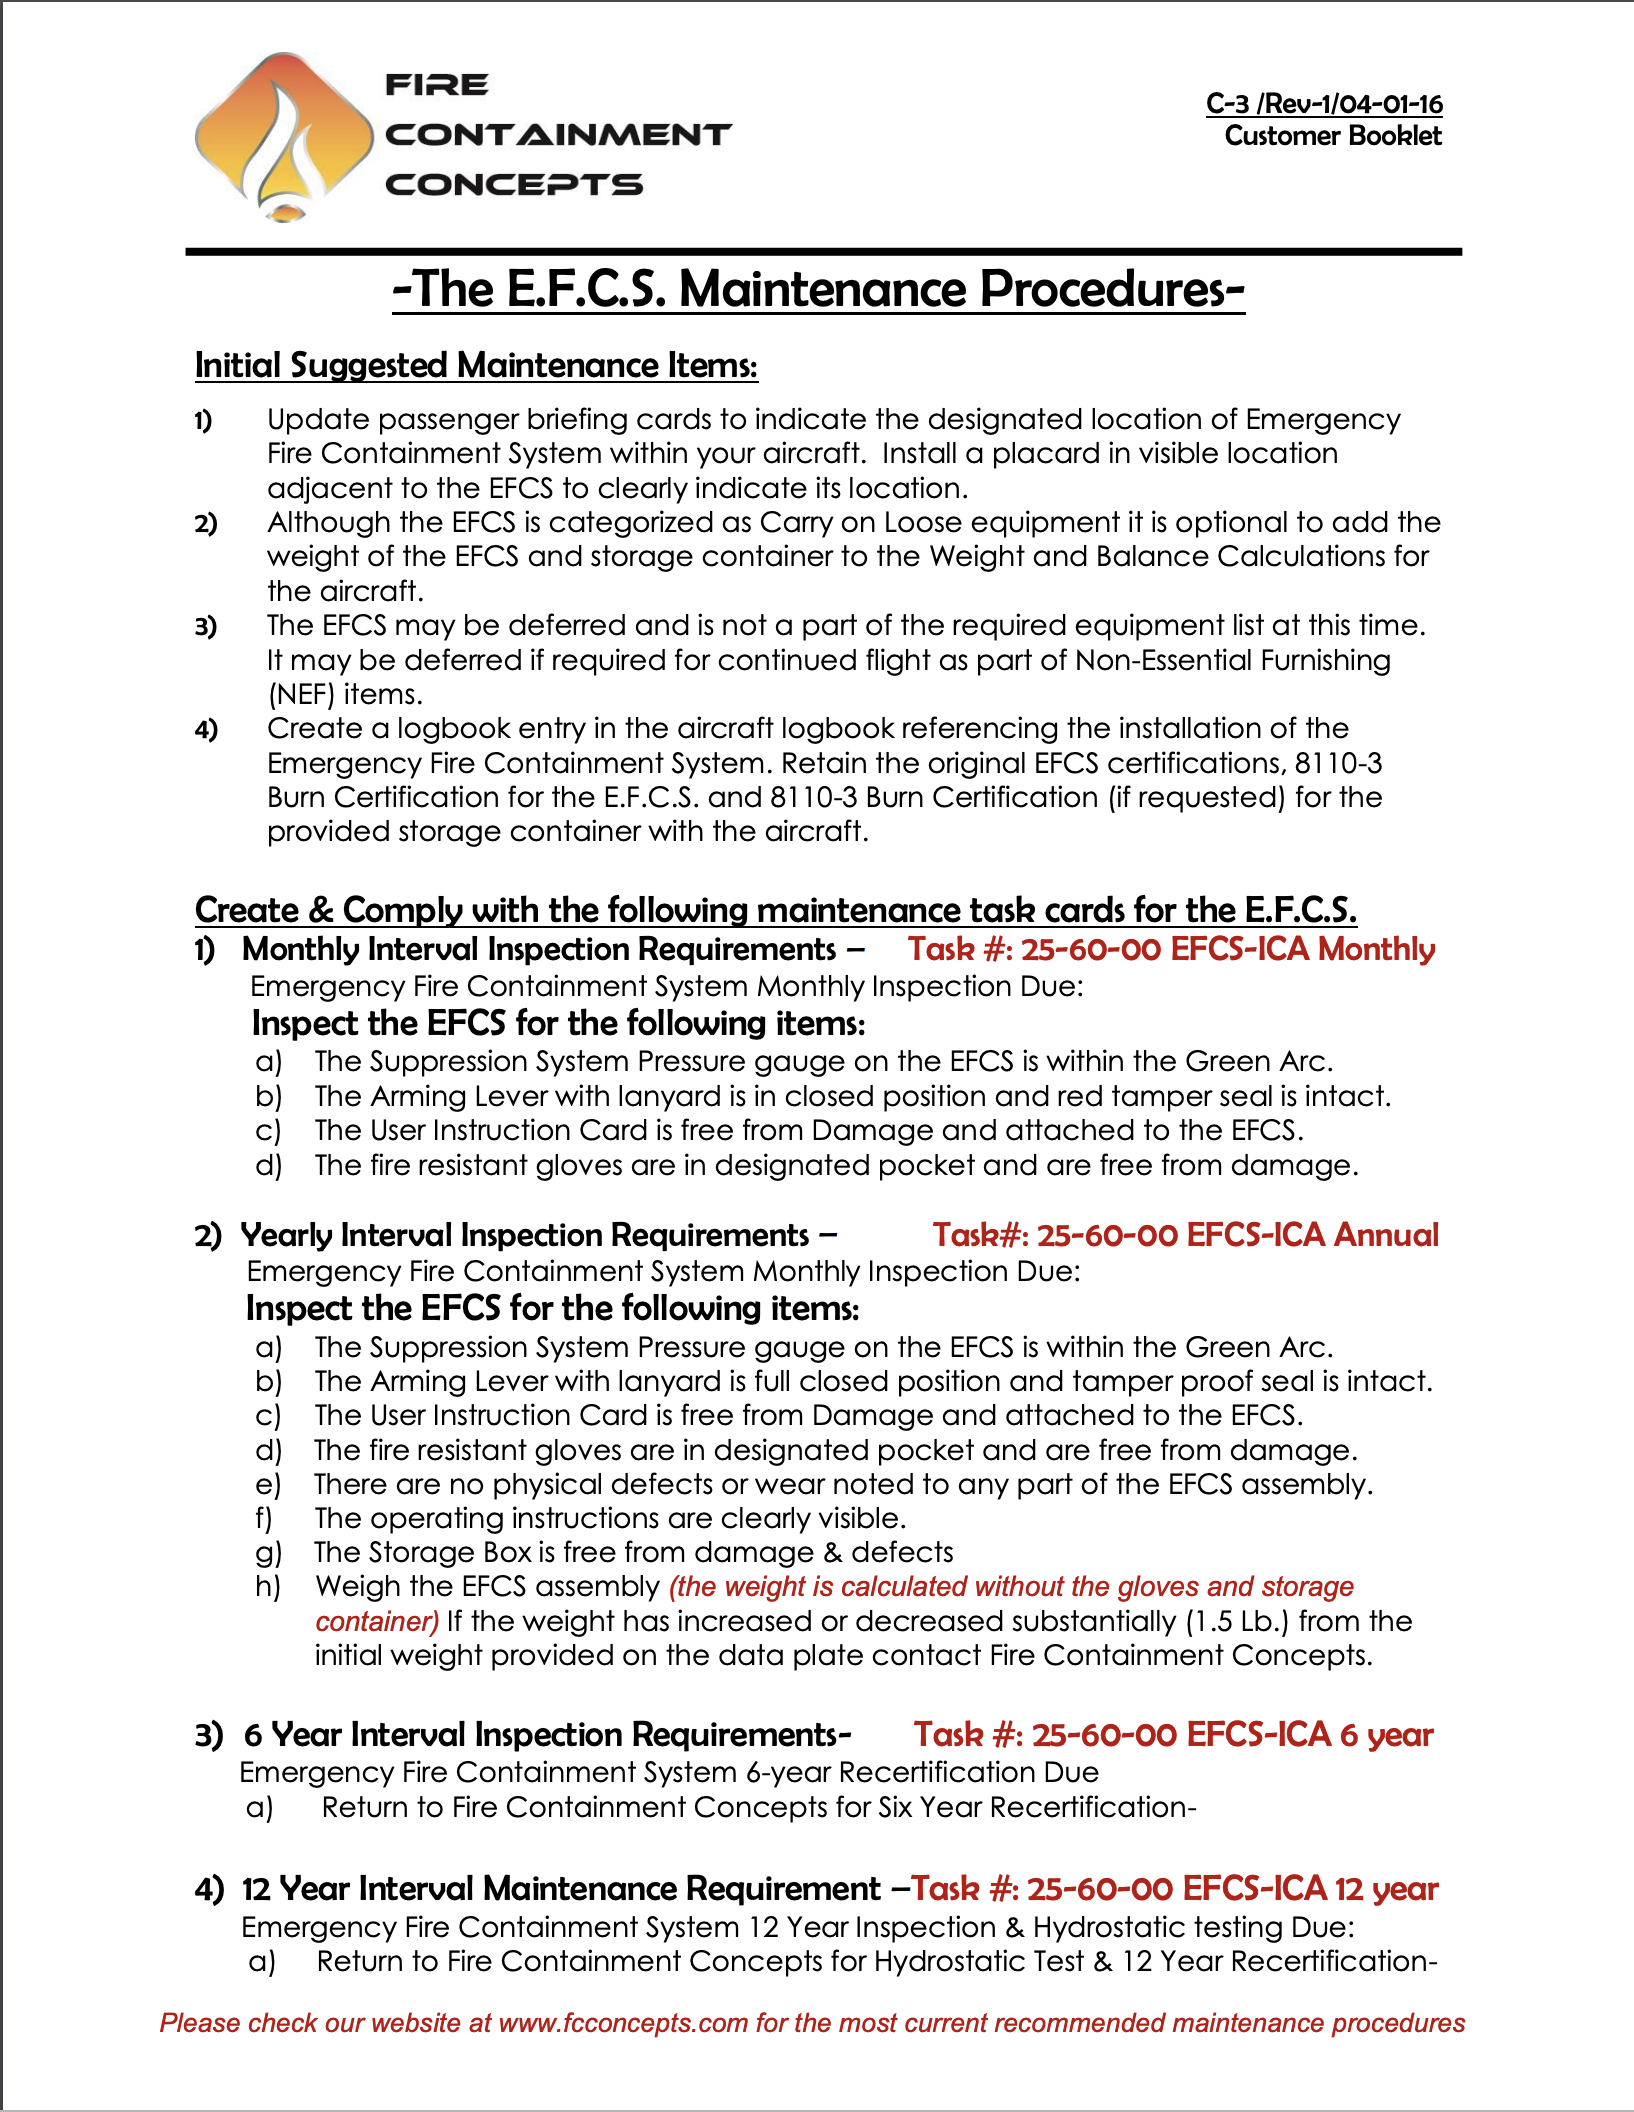 Customer Booklet (C-3) Rev 4 Maintenance procedures